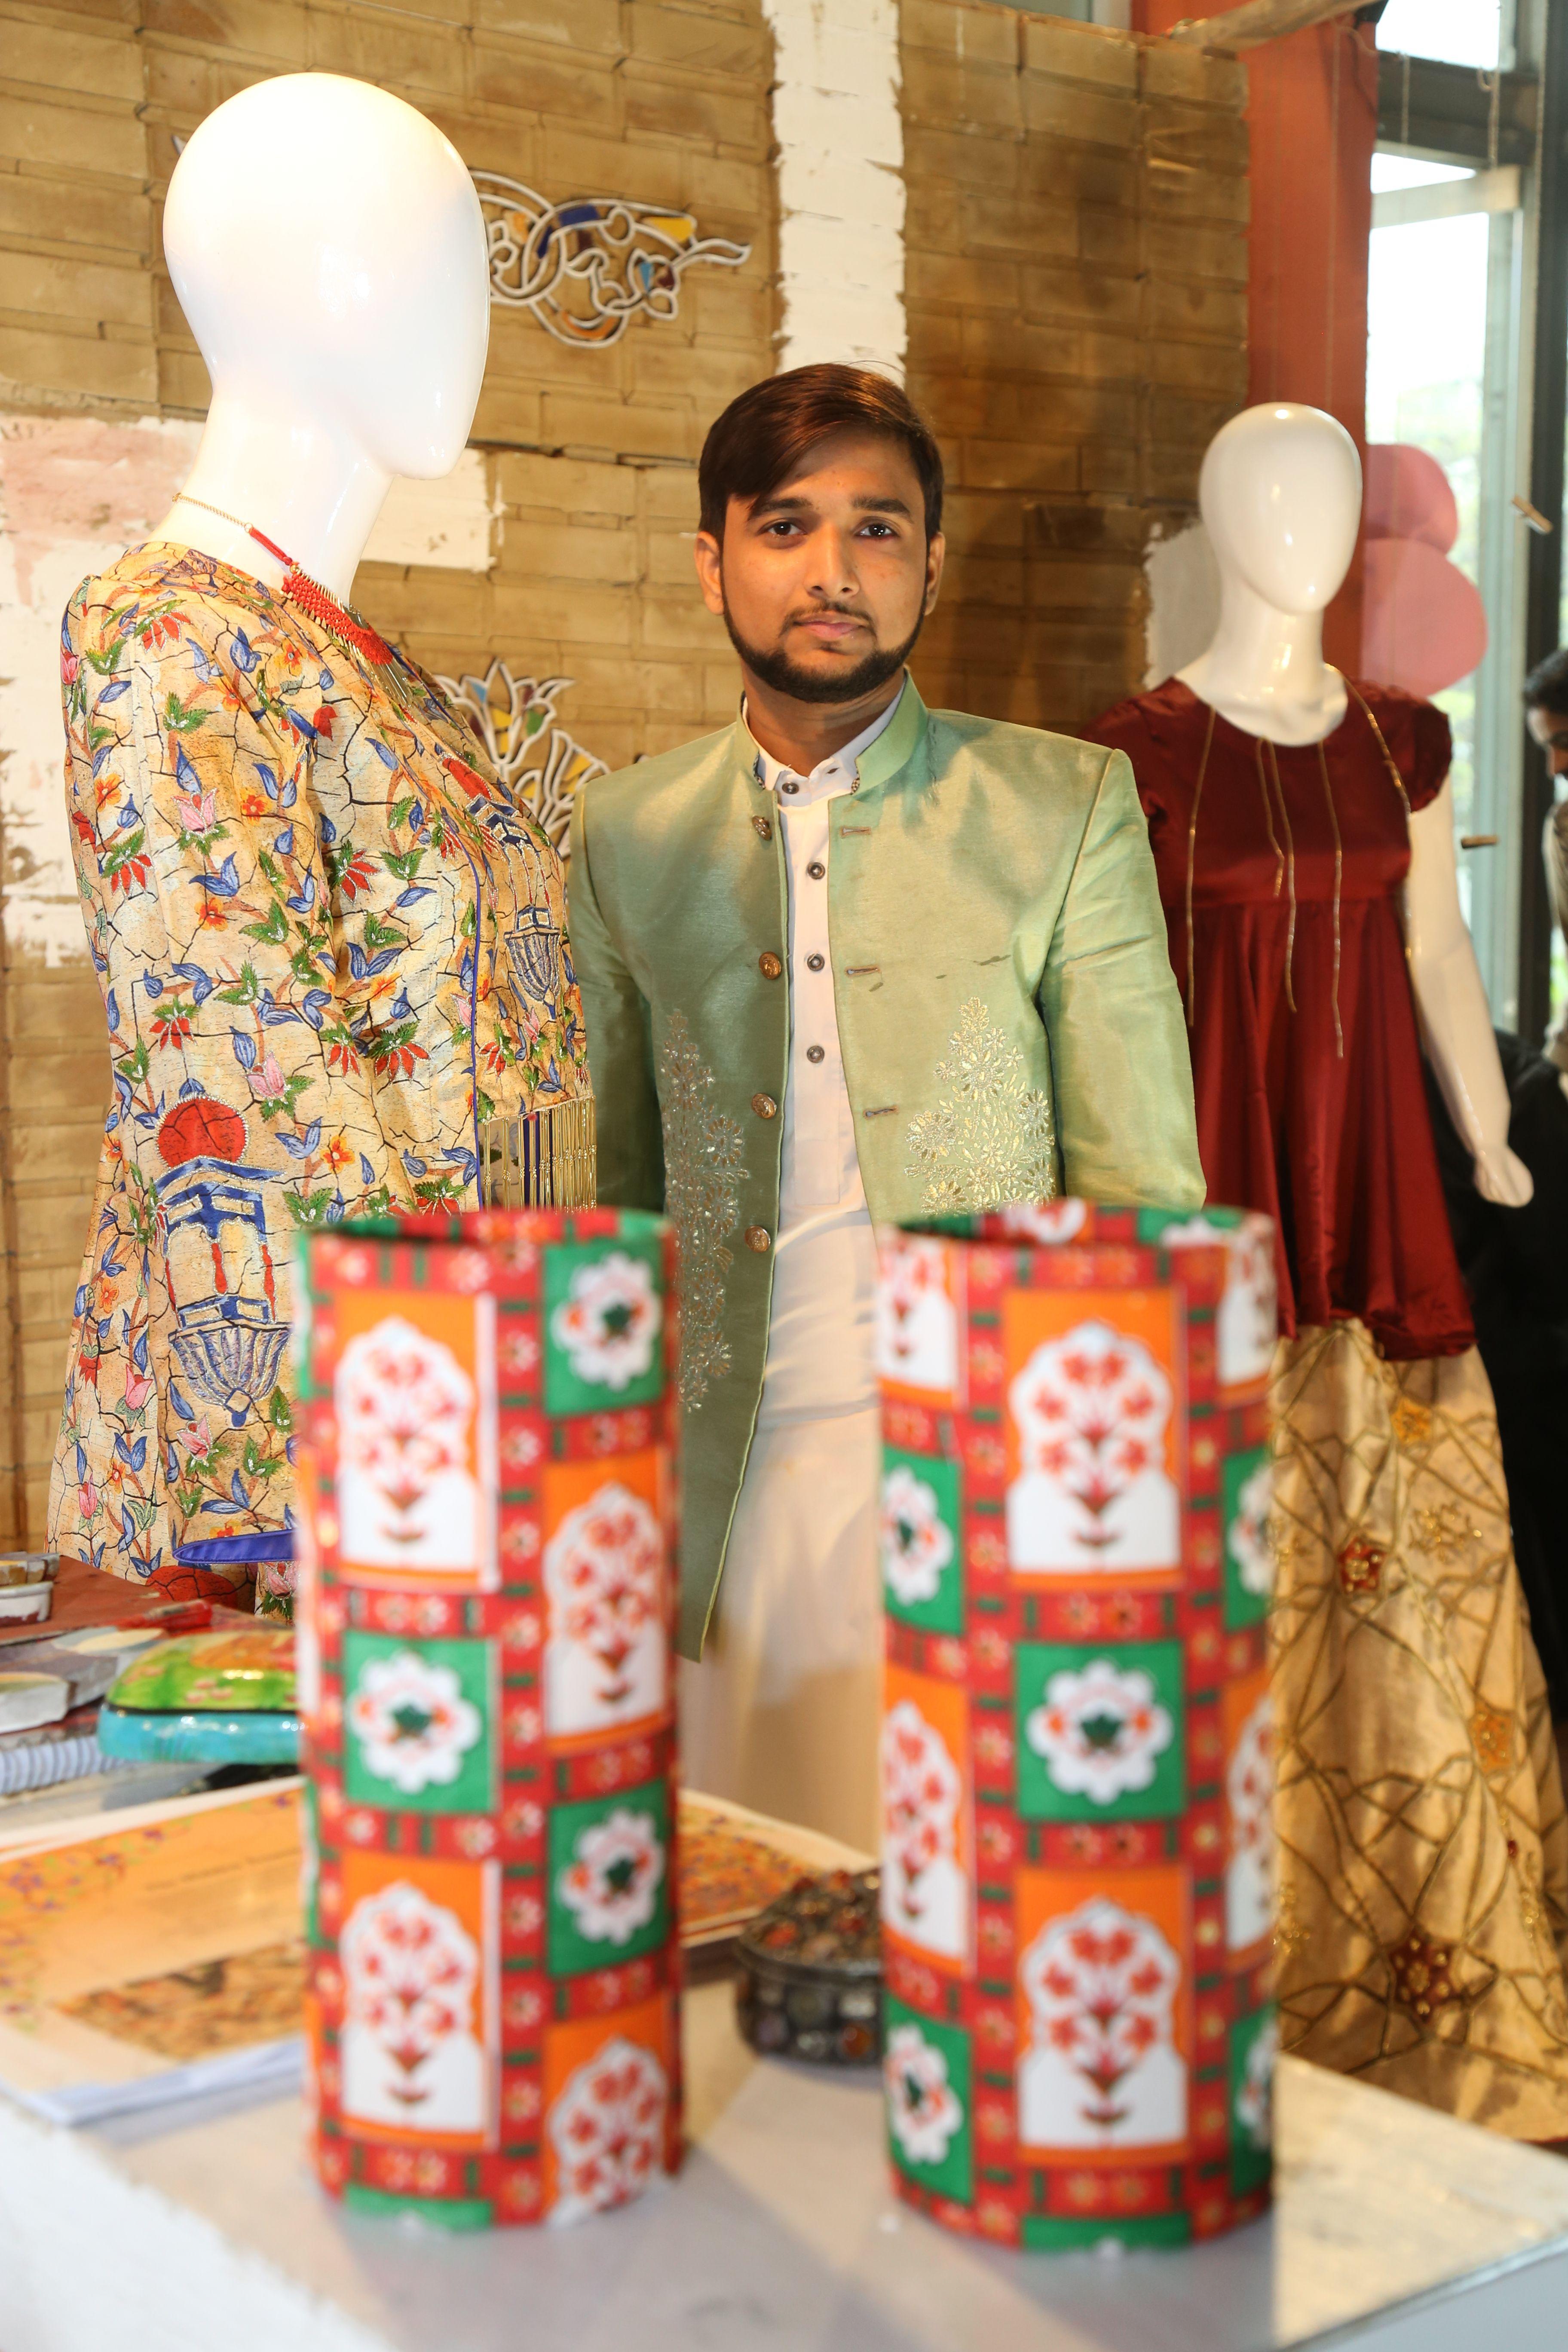 Hu Fashion Textile Design Thesis Display 2019 Hajveryuniversity Oneuniversityendlesspossibilities Fashion Texti Textiles Fashion Textile Design Textiles